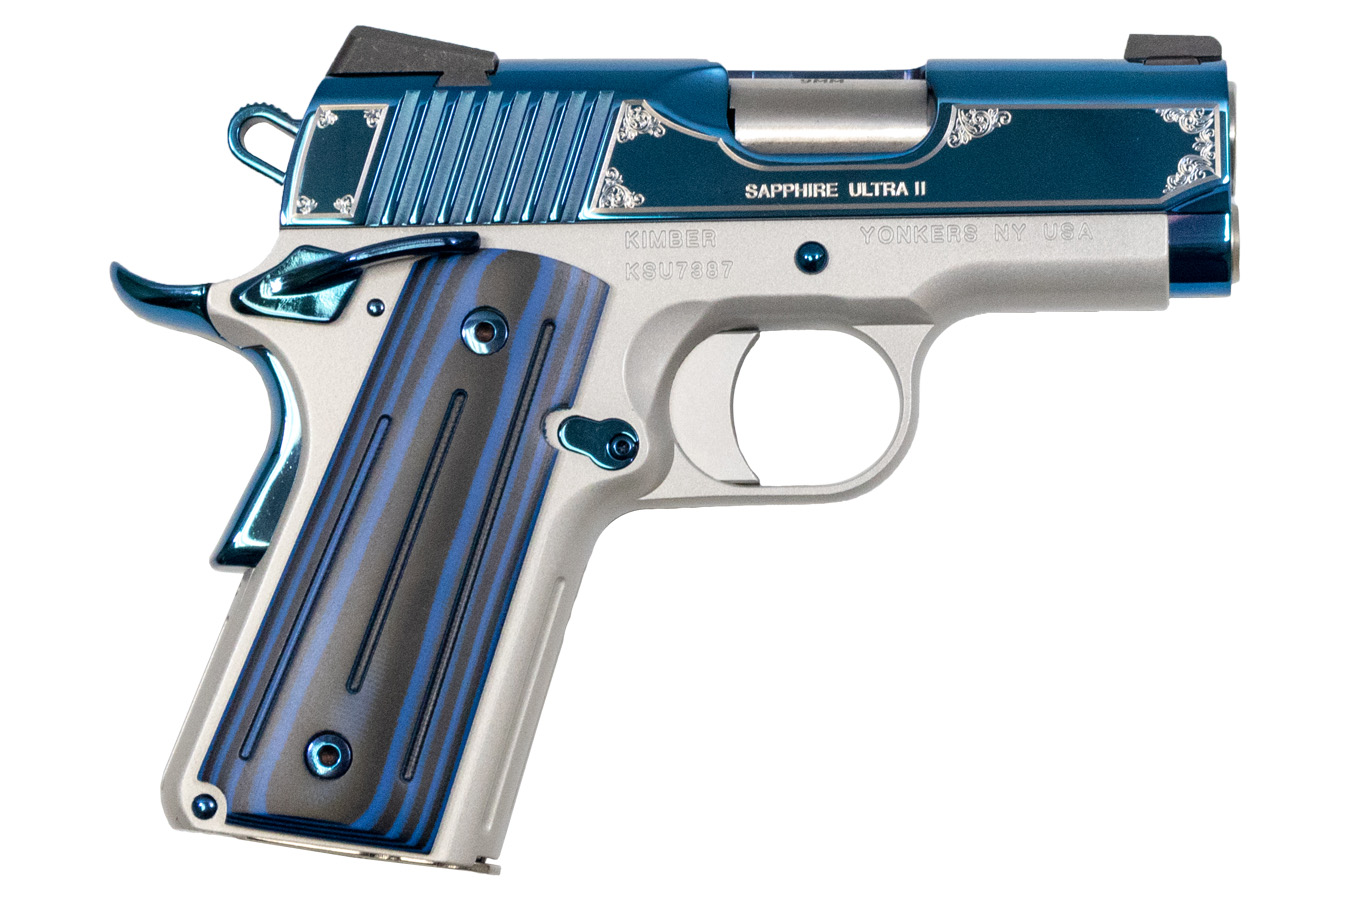 Sapphire Ultra II 9mm Pistol with Night Sights